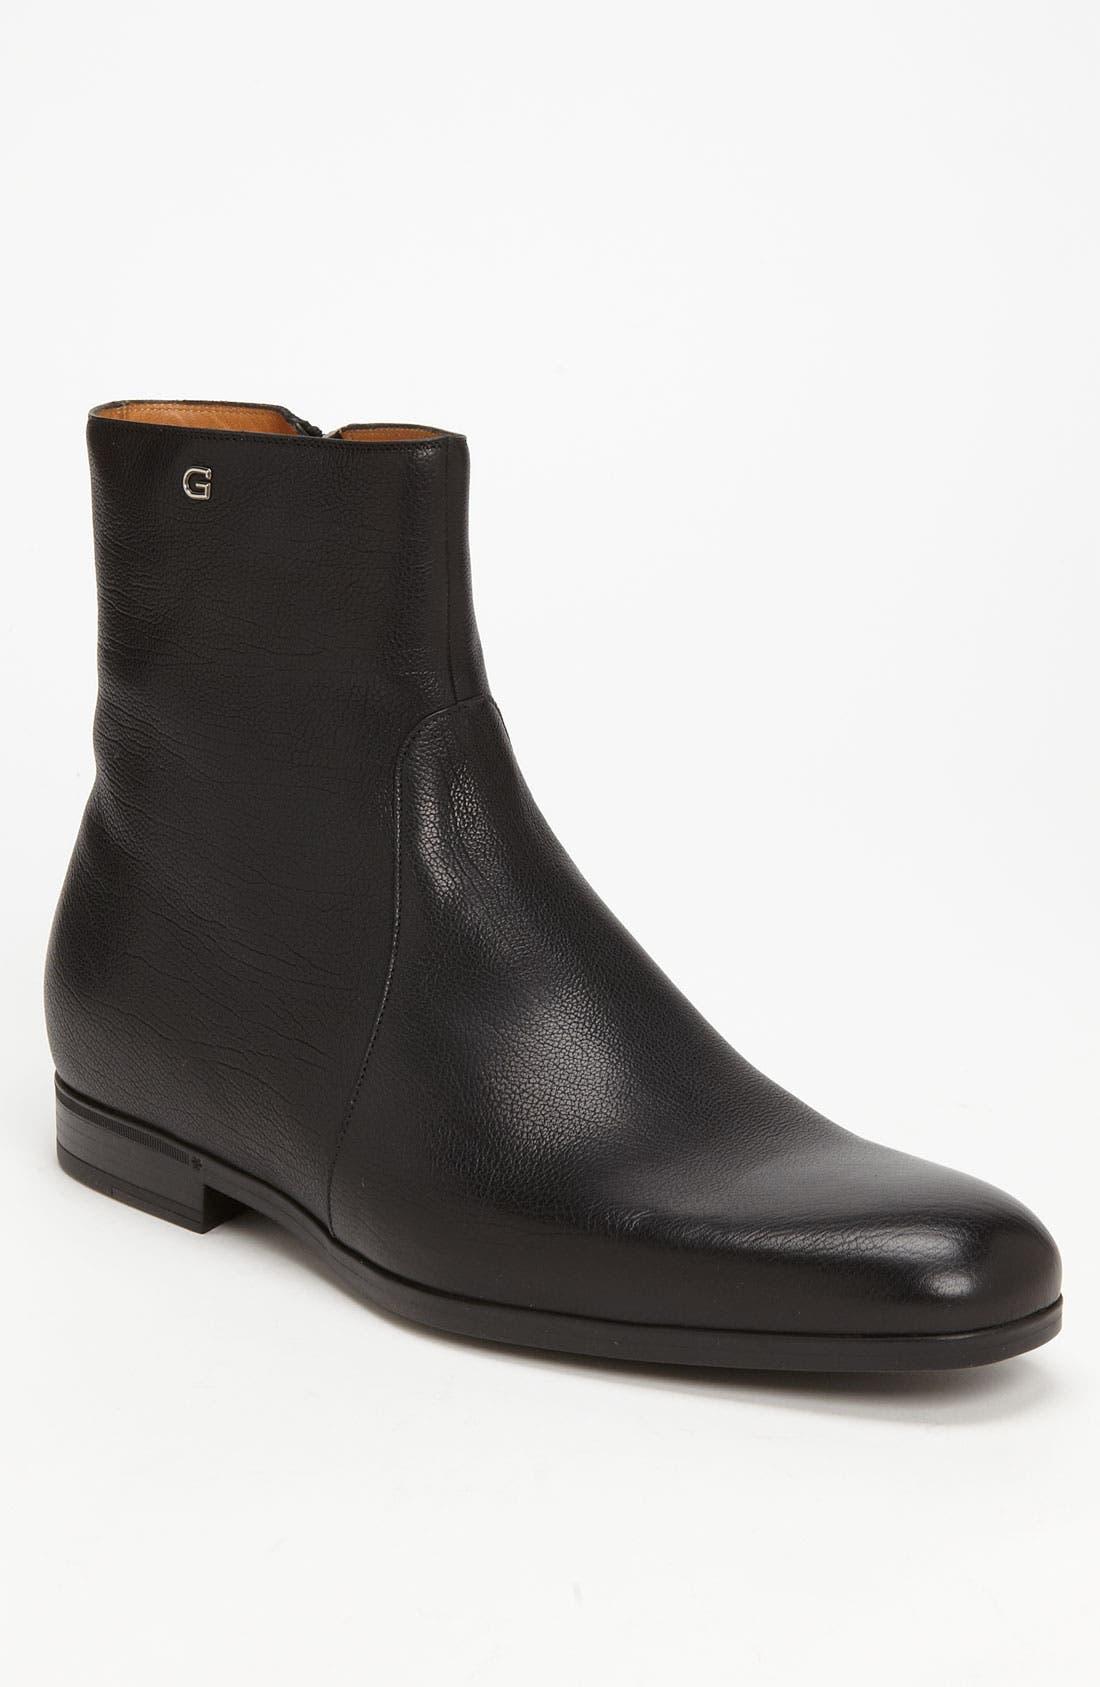 Main Image - Gucci 'Deroy' Plain Toe Boot